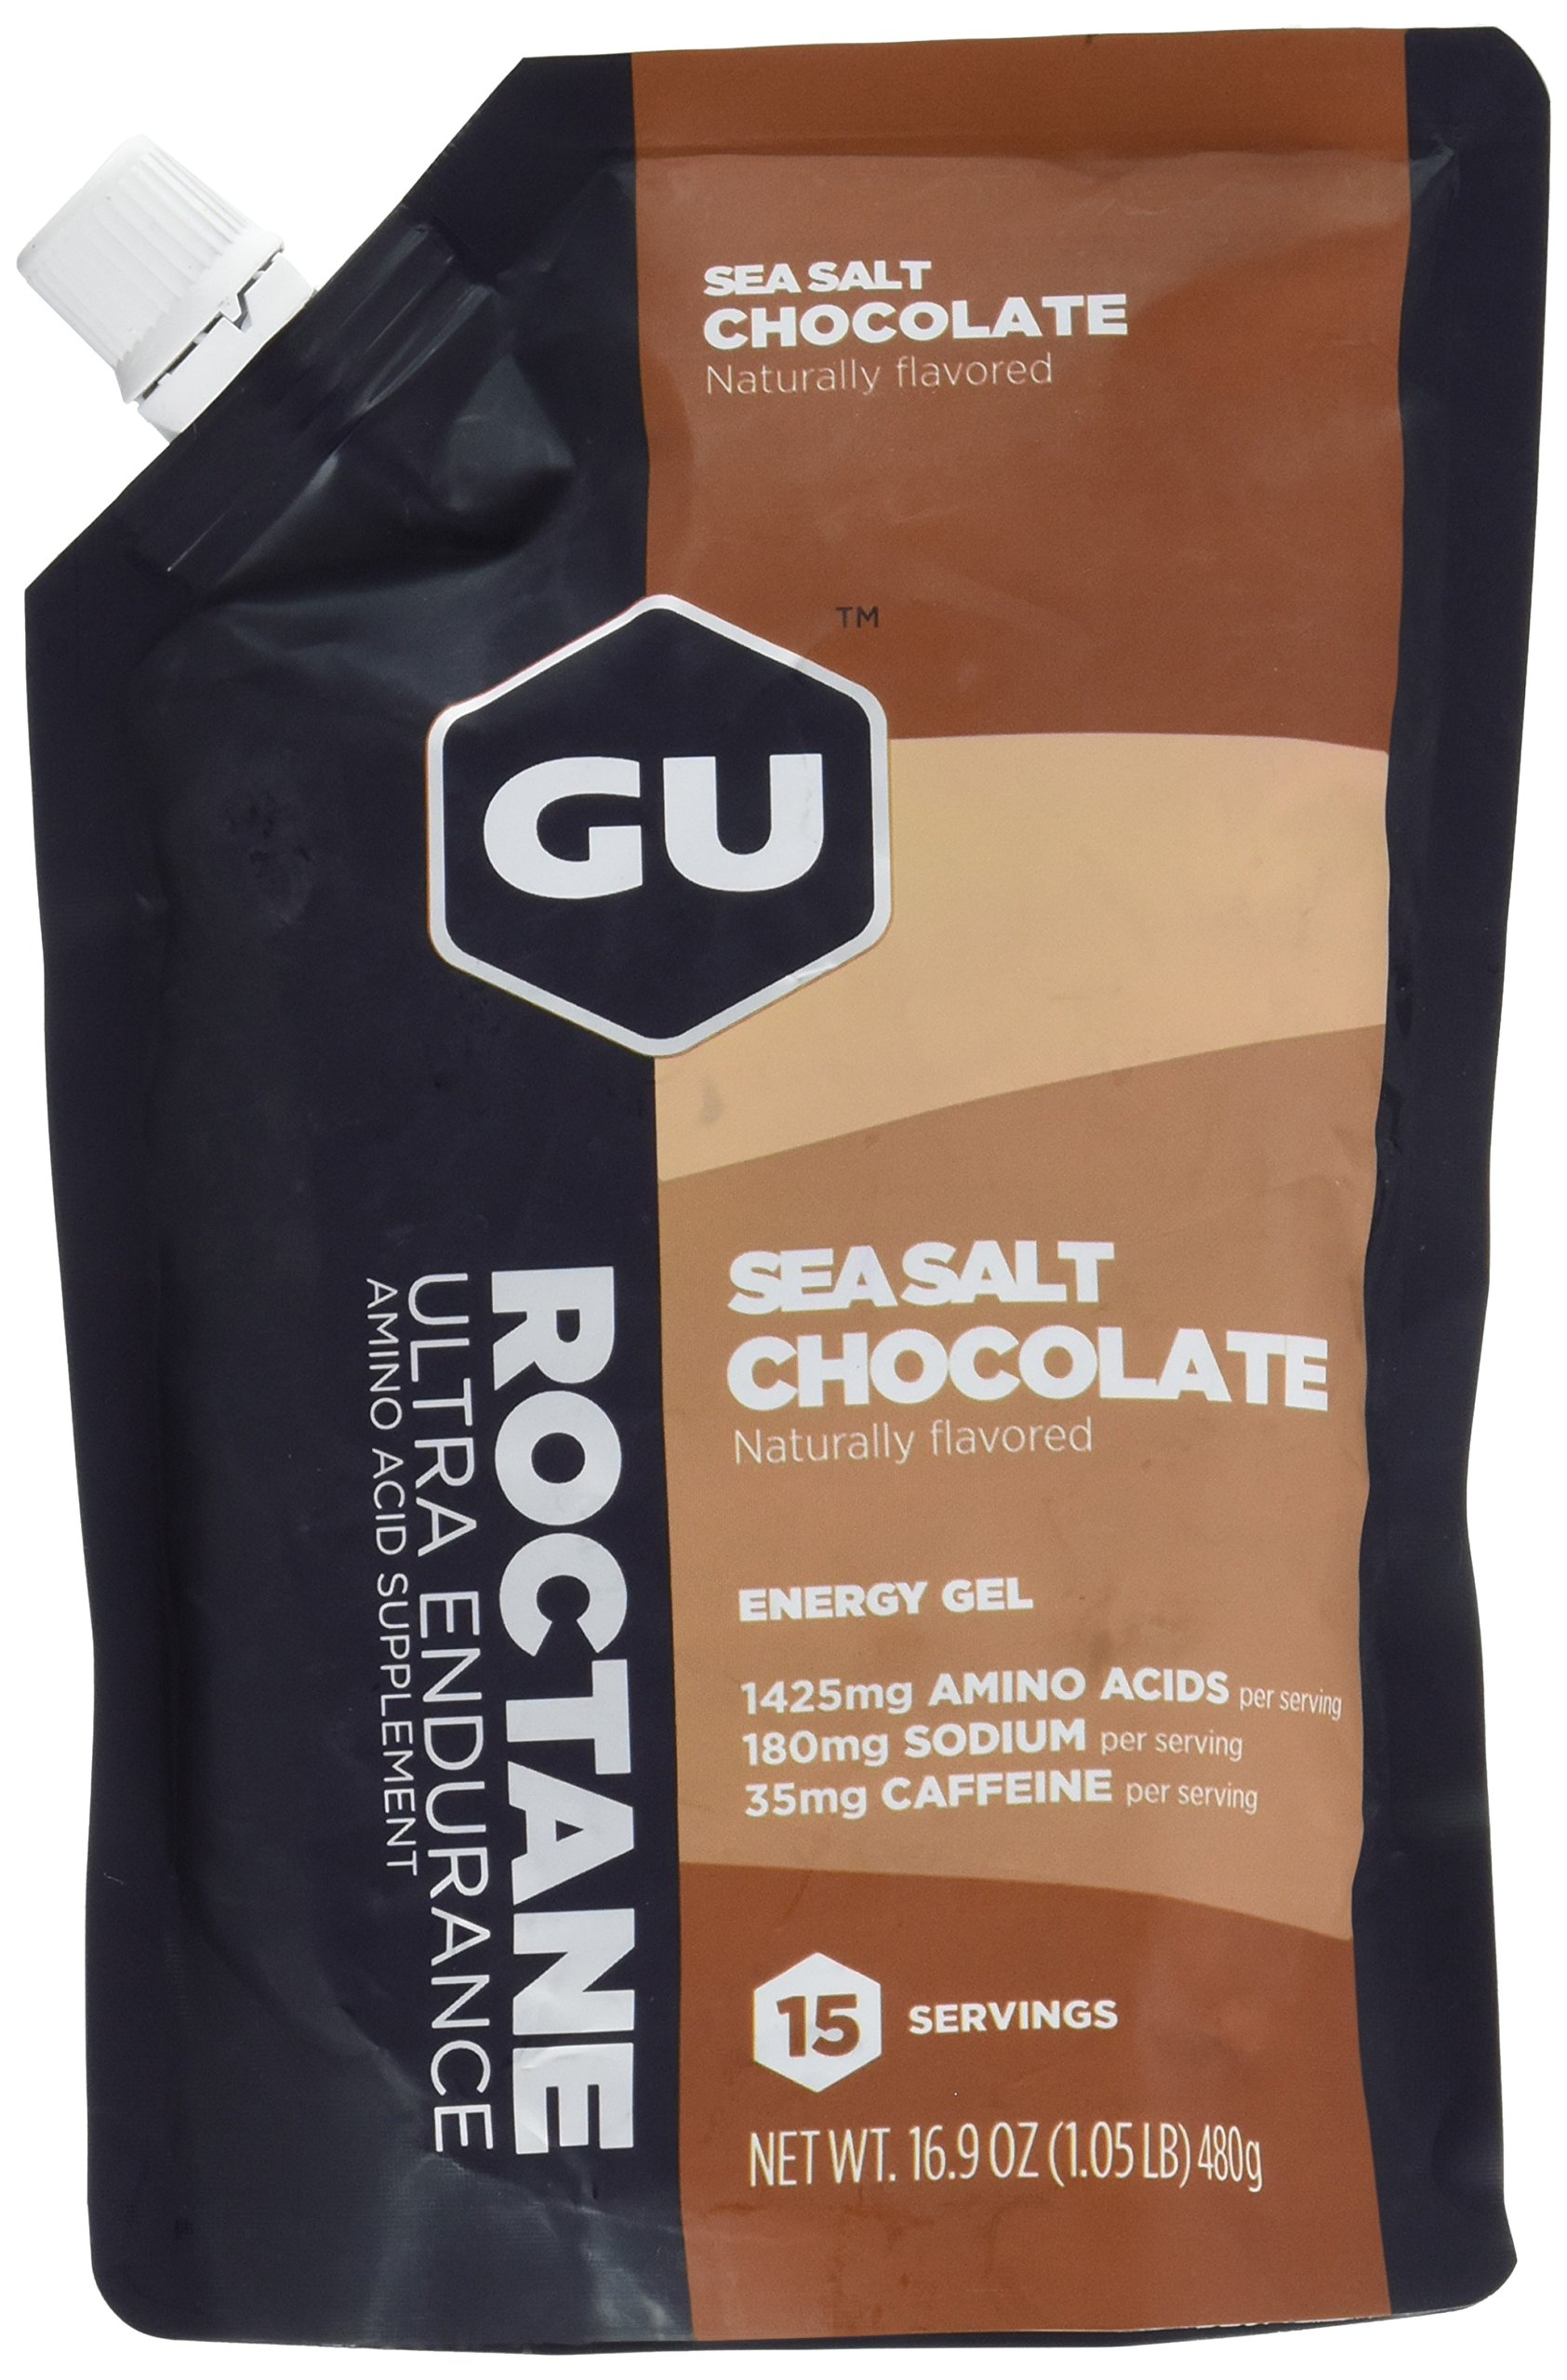 GU Energy Roctane Ultra Endurance Energy Gel, Sea Salt Chocolate, 15-Serving Pouch by GU Energy Labs